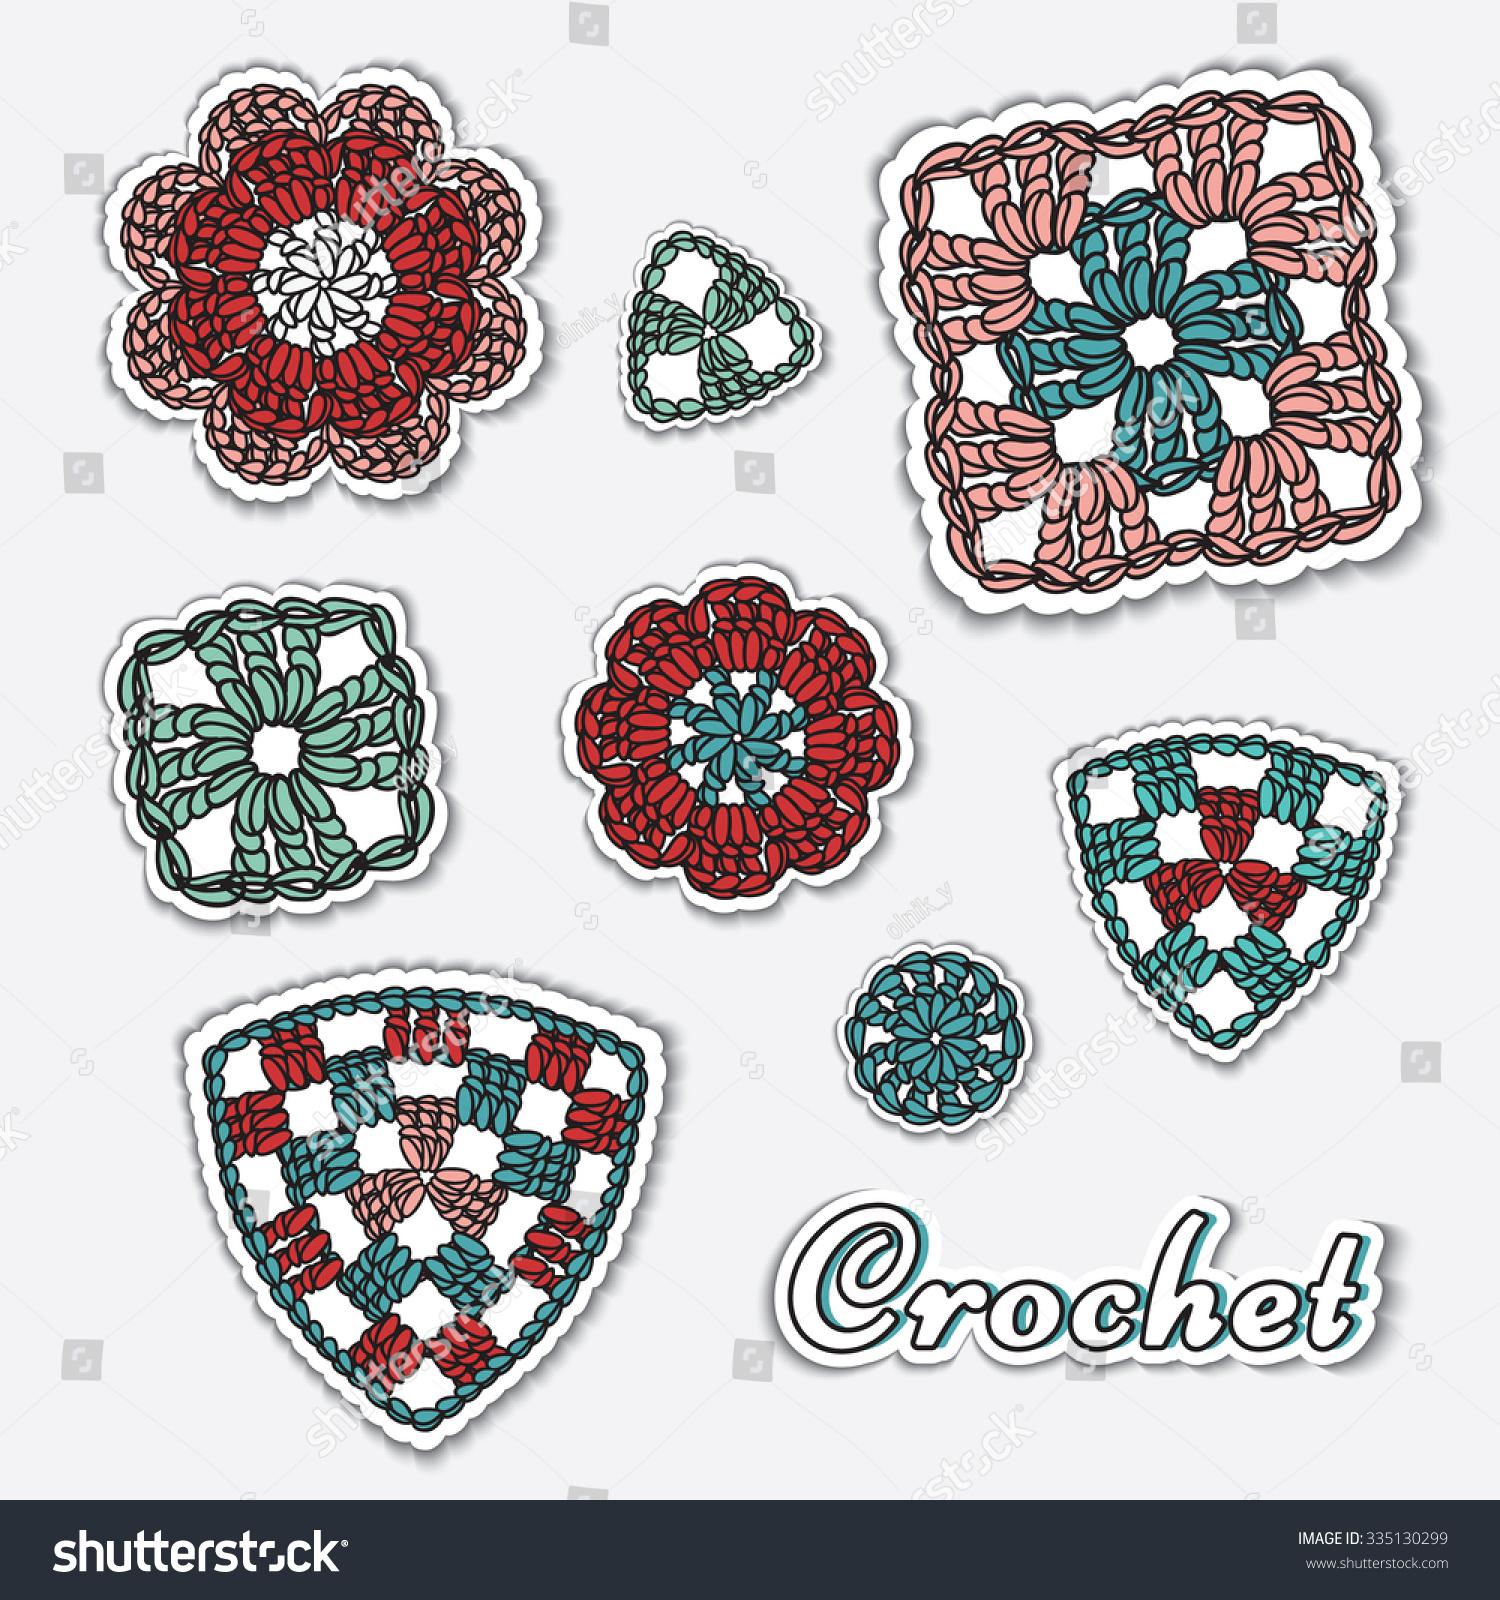 Crochet Stitches Vector : ... crochet elements. Granny square, flower, triangle. Crochet stitches